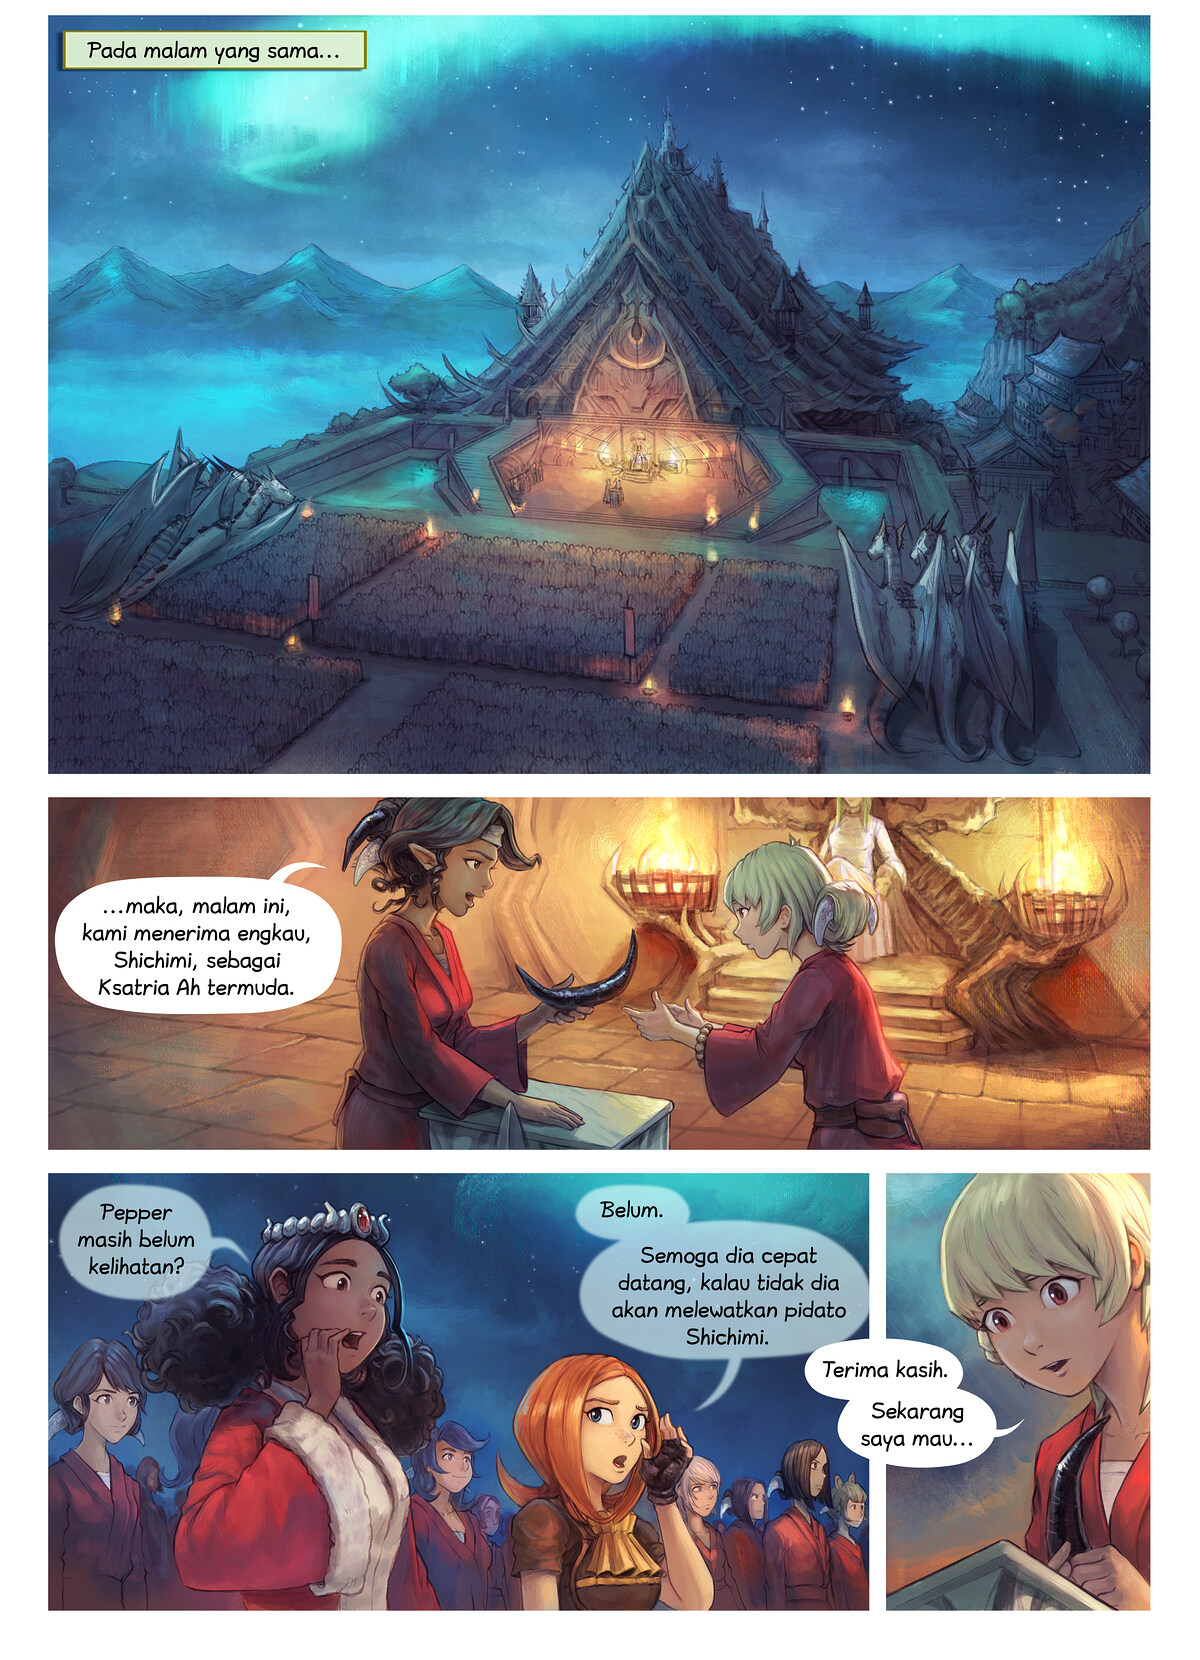 Episode 34: Pemberian Gelar Ksatria Shichimi, Page 1